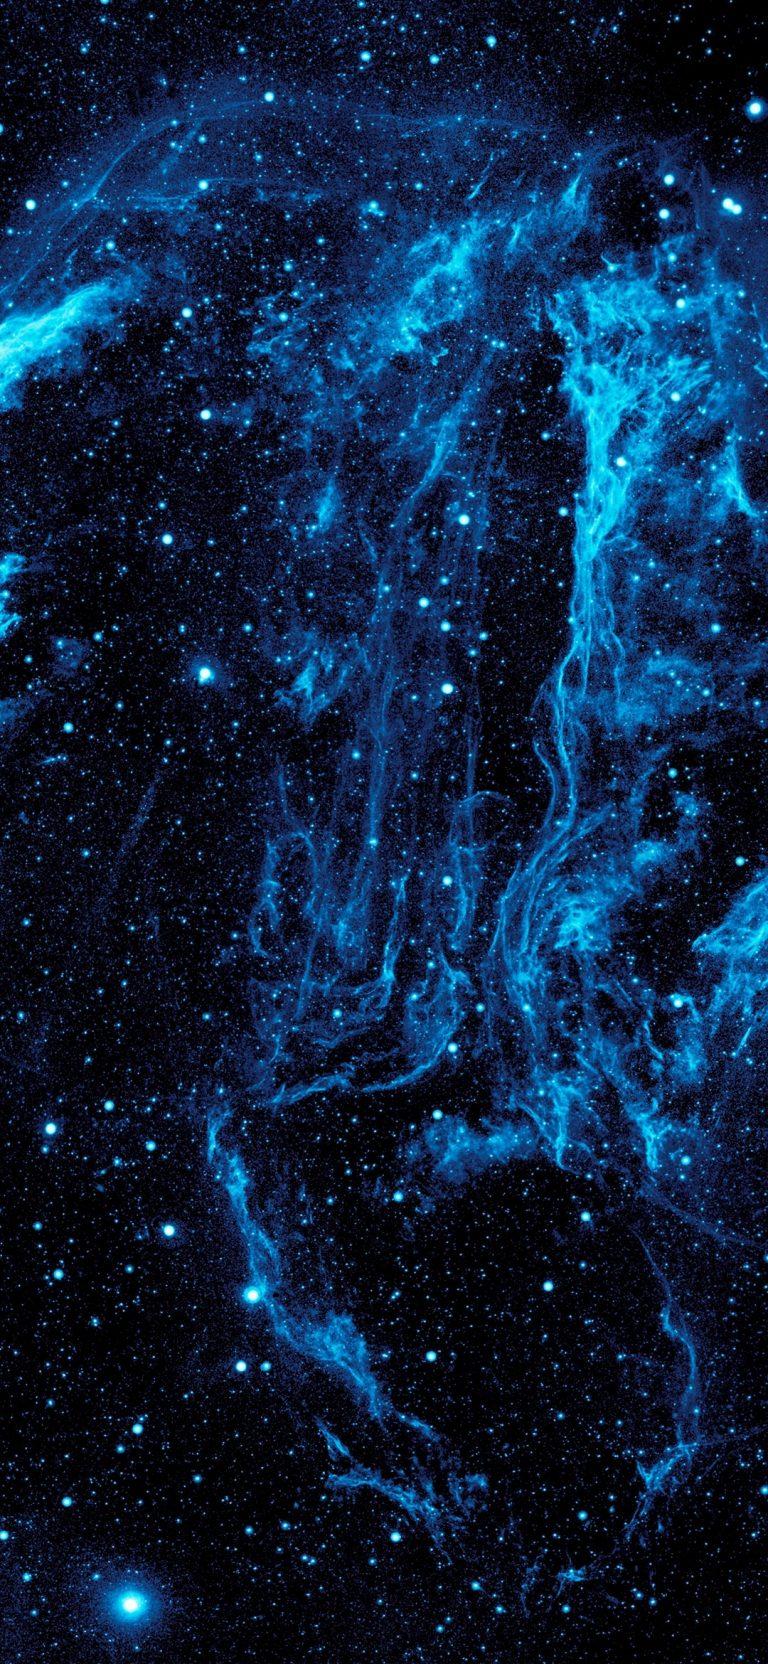 Space Phone Wallpaper 231 1080x2340 768x1664